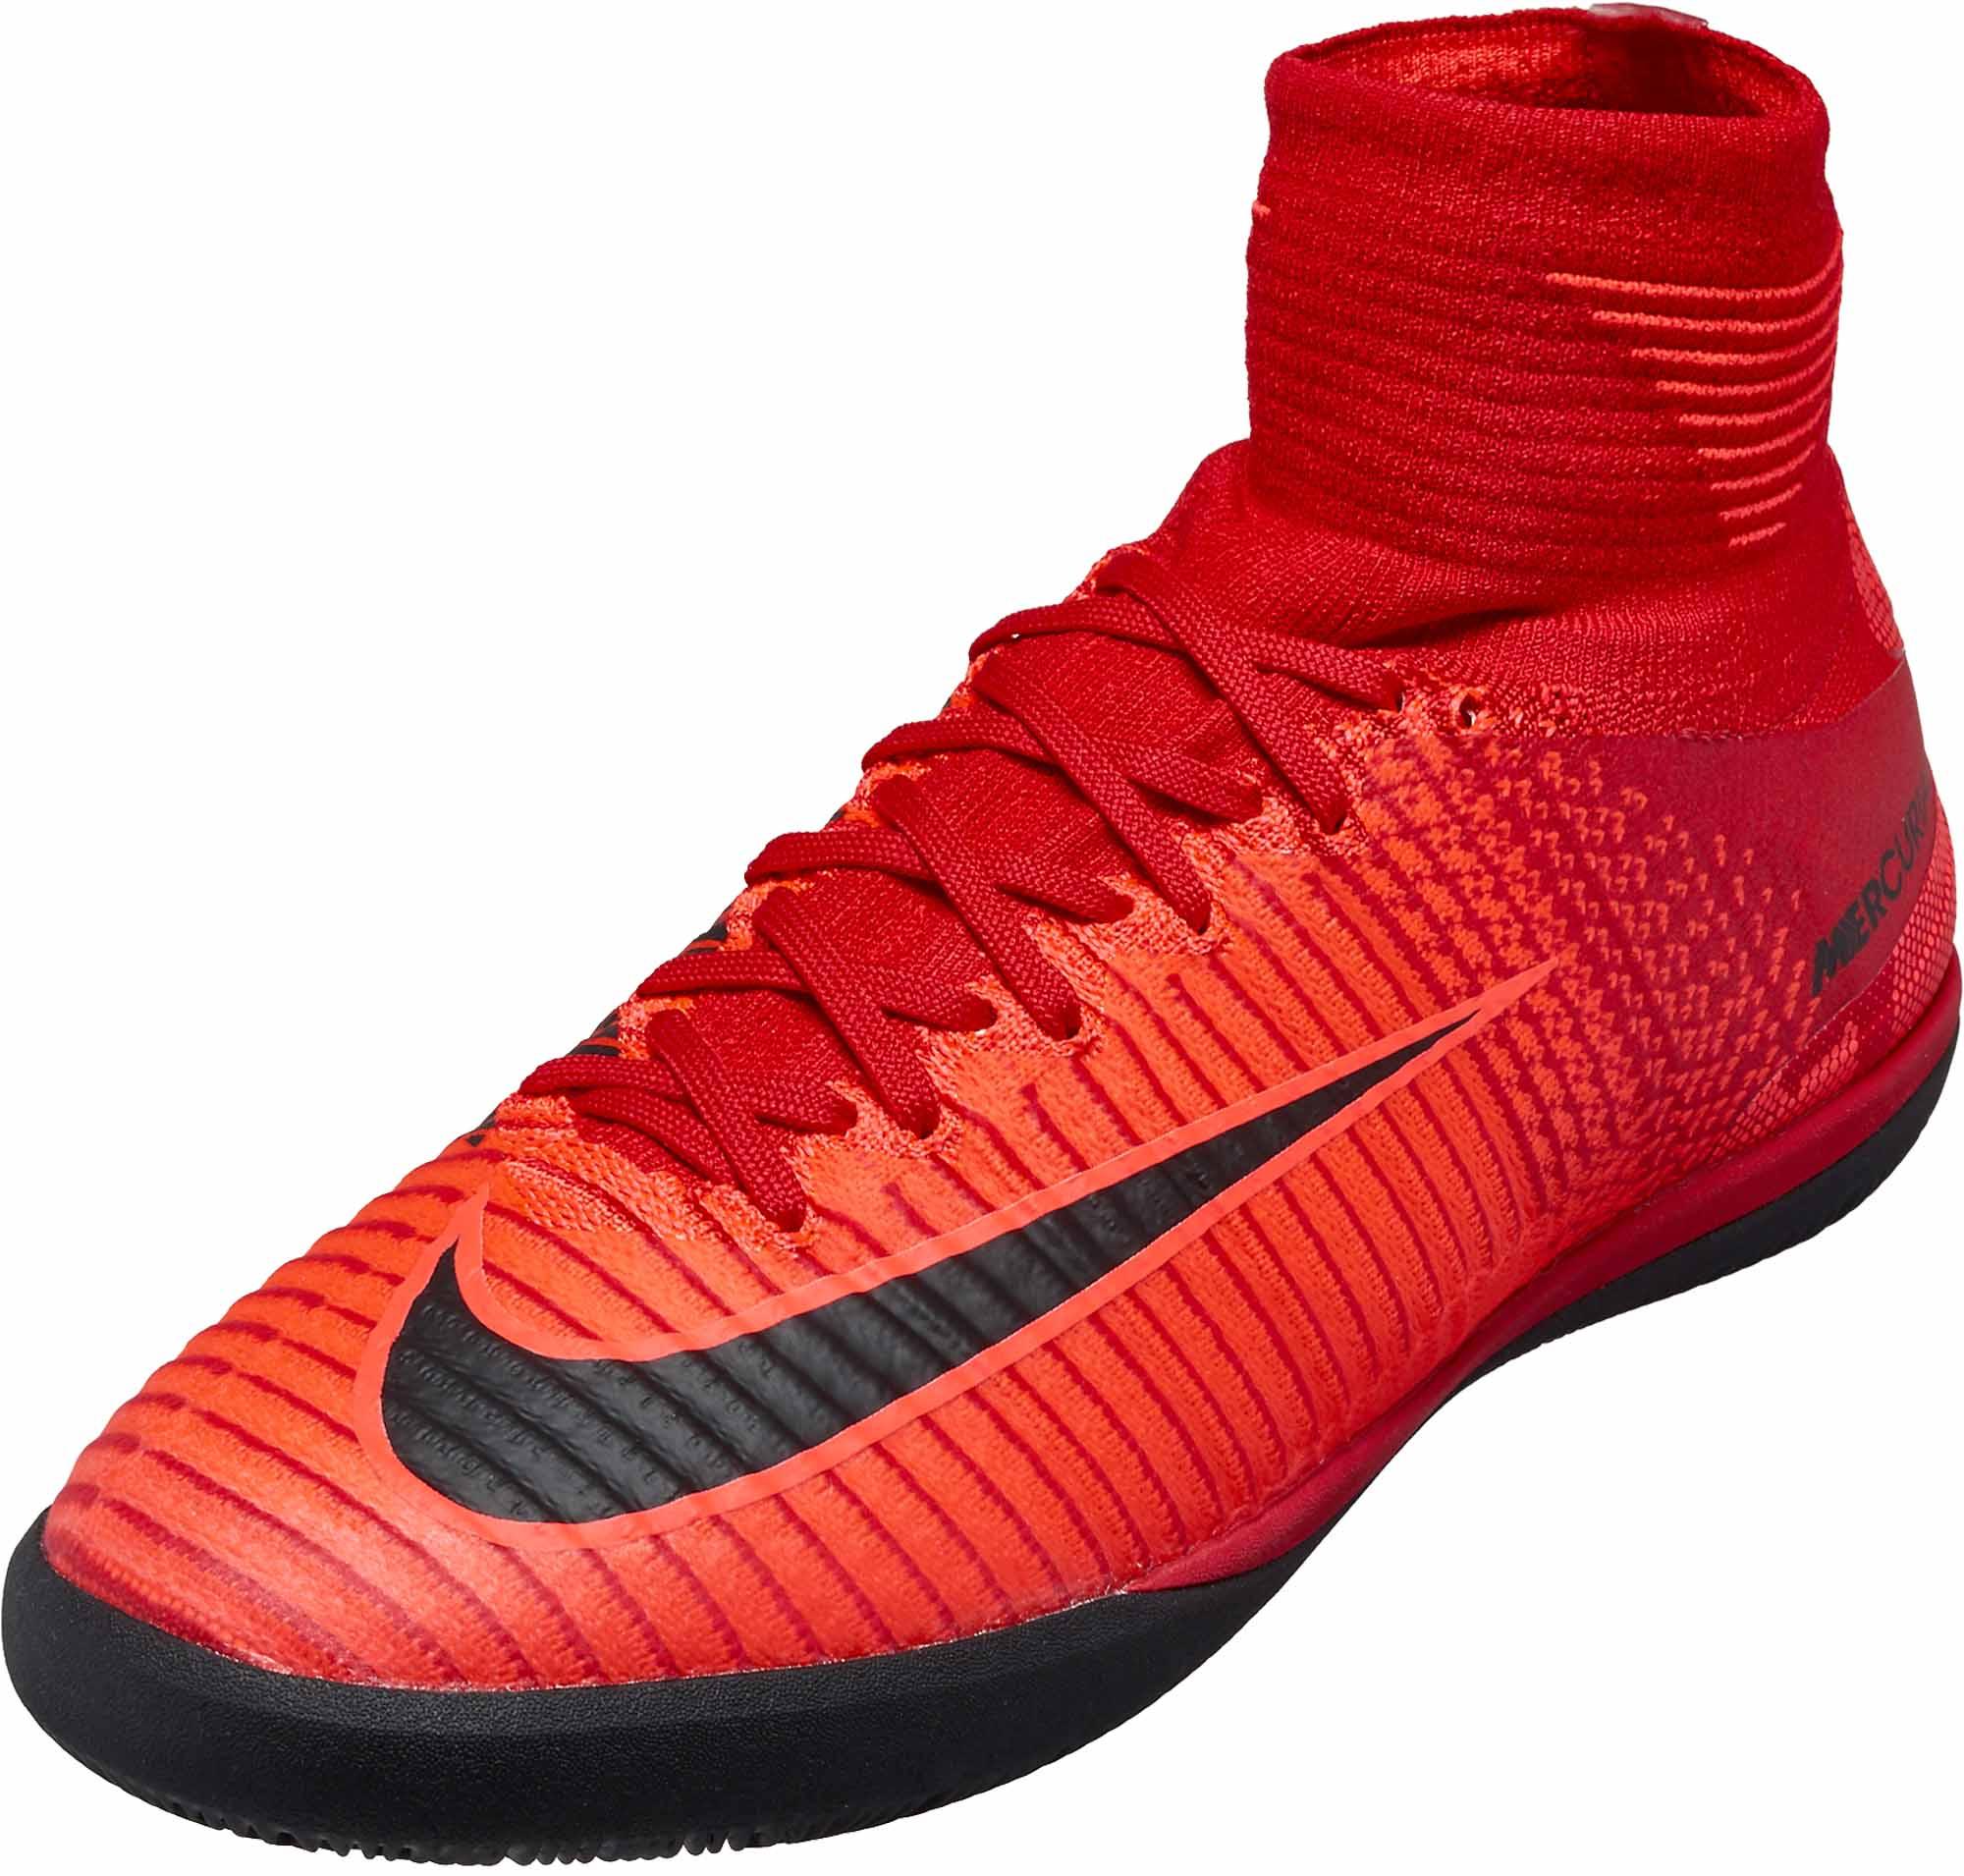 quality design 280c1 c120d Nike Kids MercurialX Proximo II IC – University Red Black